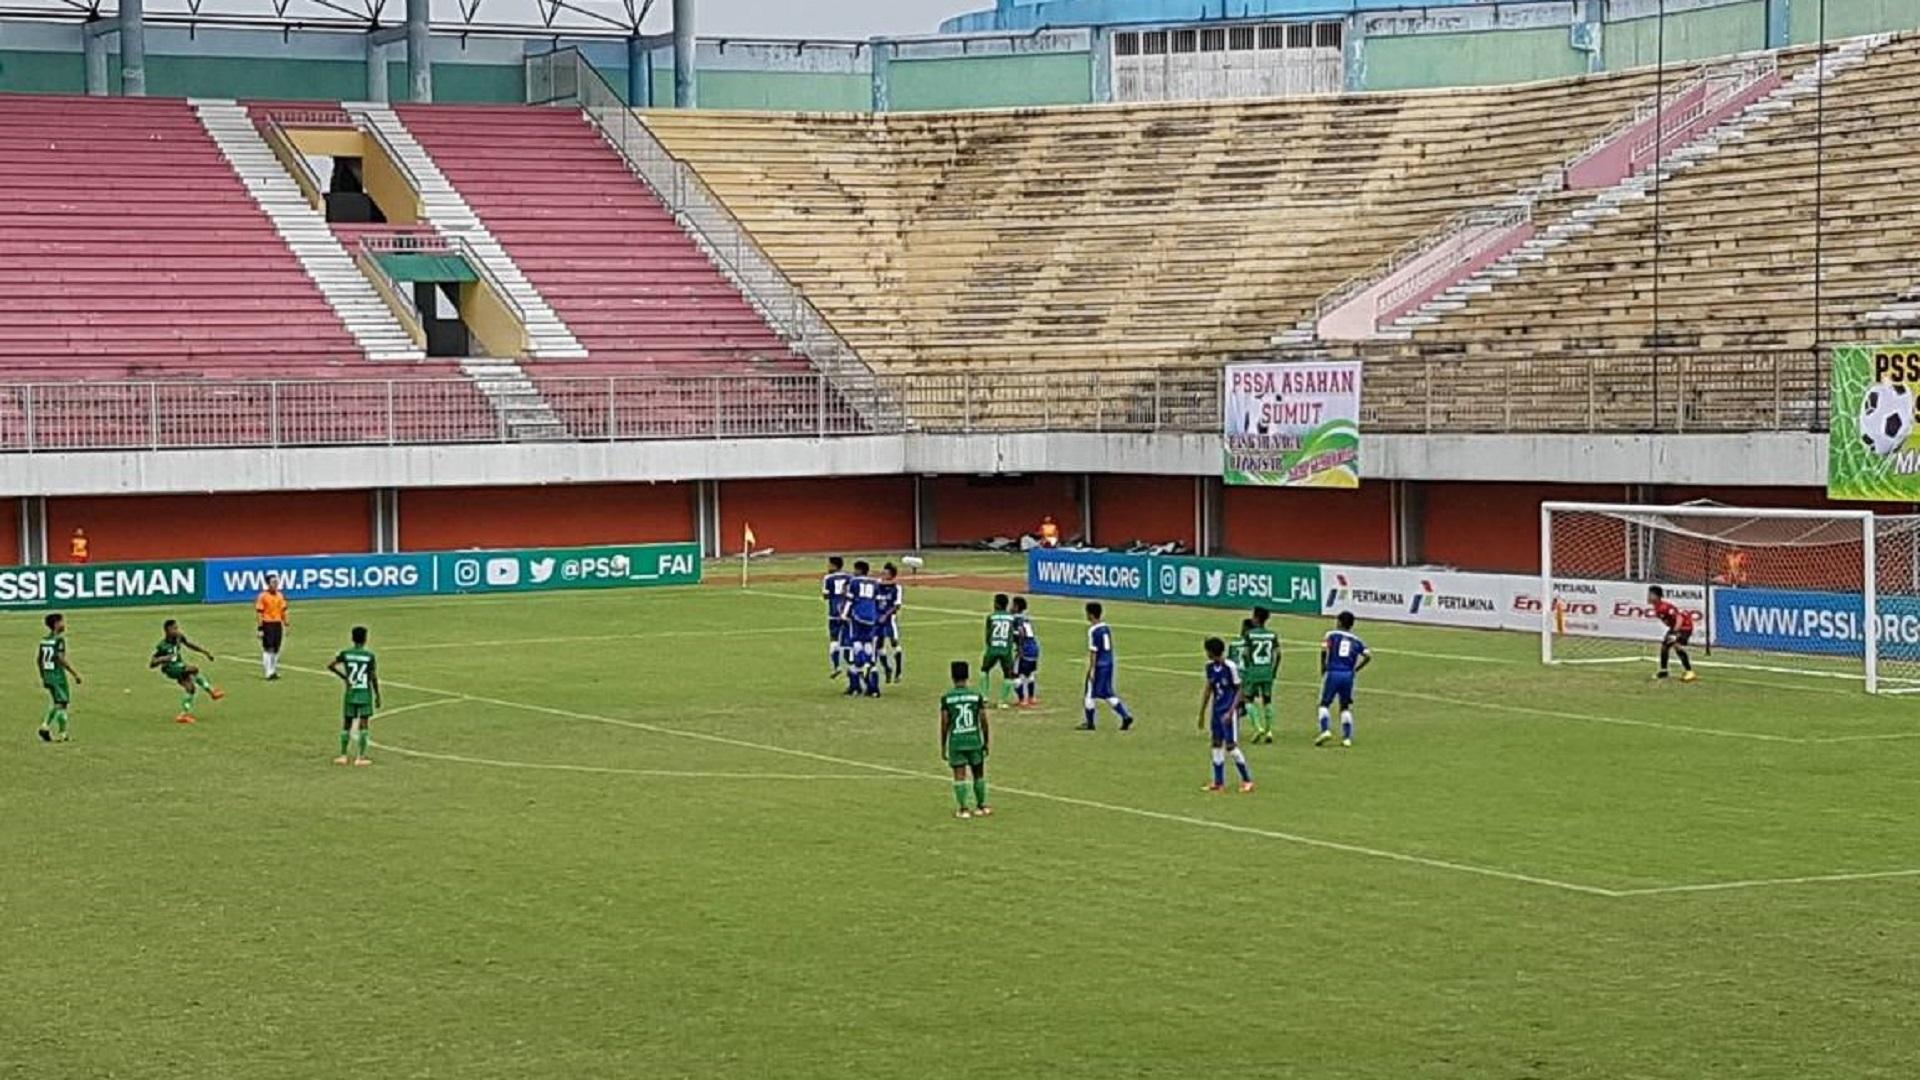 Piala Soeratin U-15 2017 | Sumatera Utara vs Jawa Barat